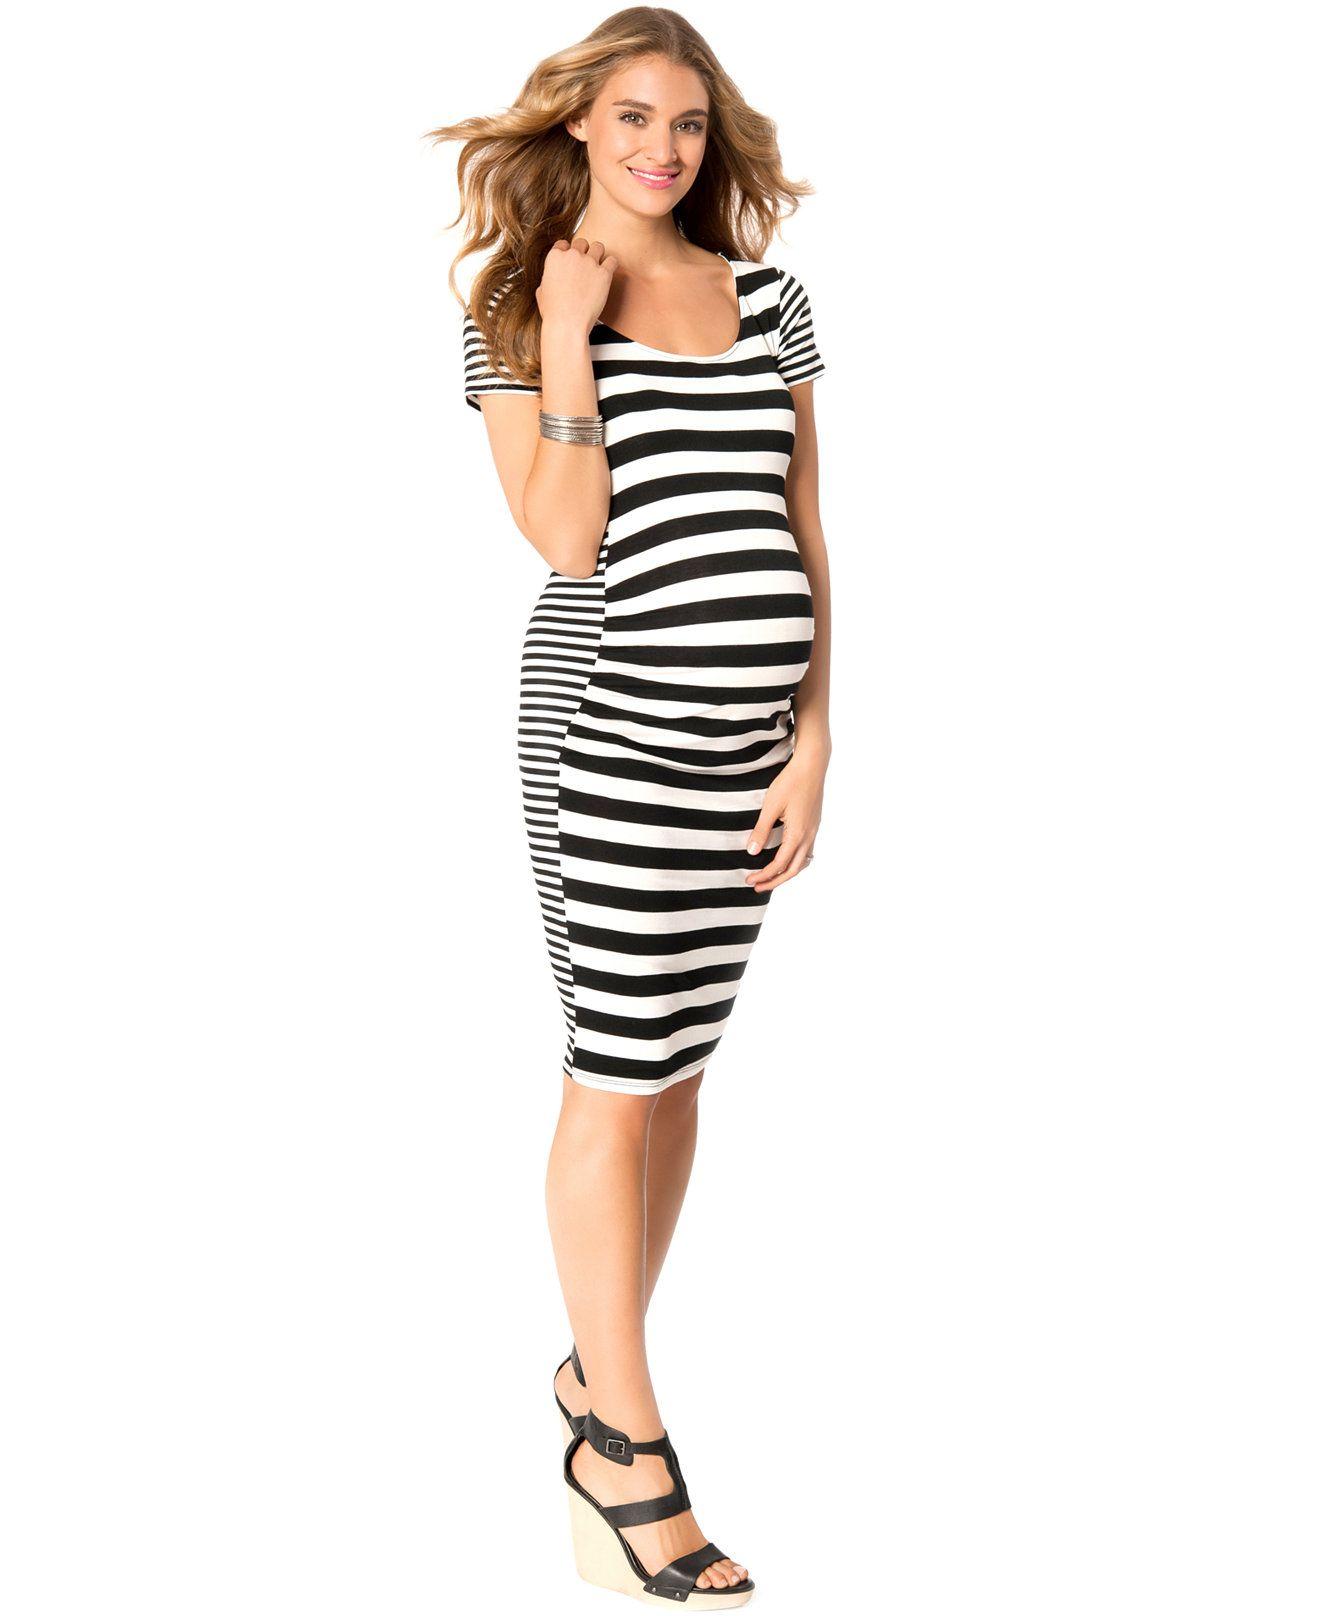 ee87dcca1 Jessica Simpson Maternity Striped Bodycon Dress - Maternity - Women - Macy s